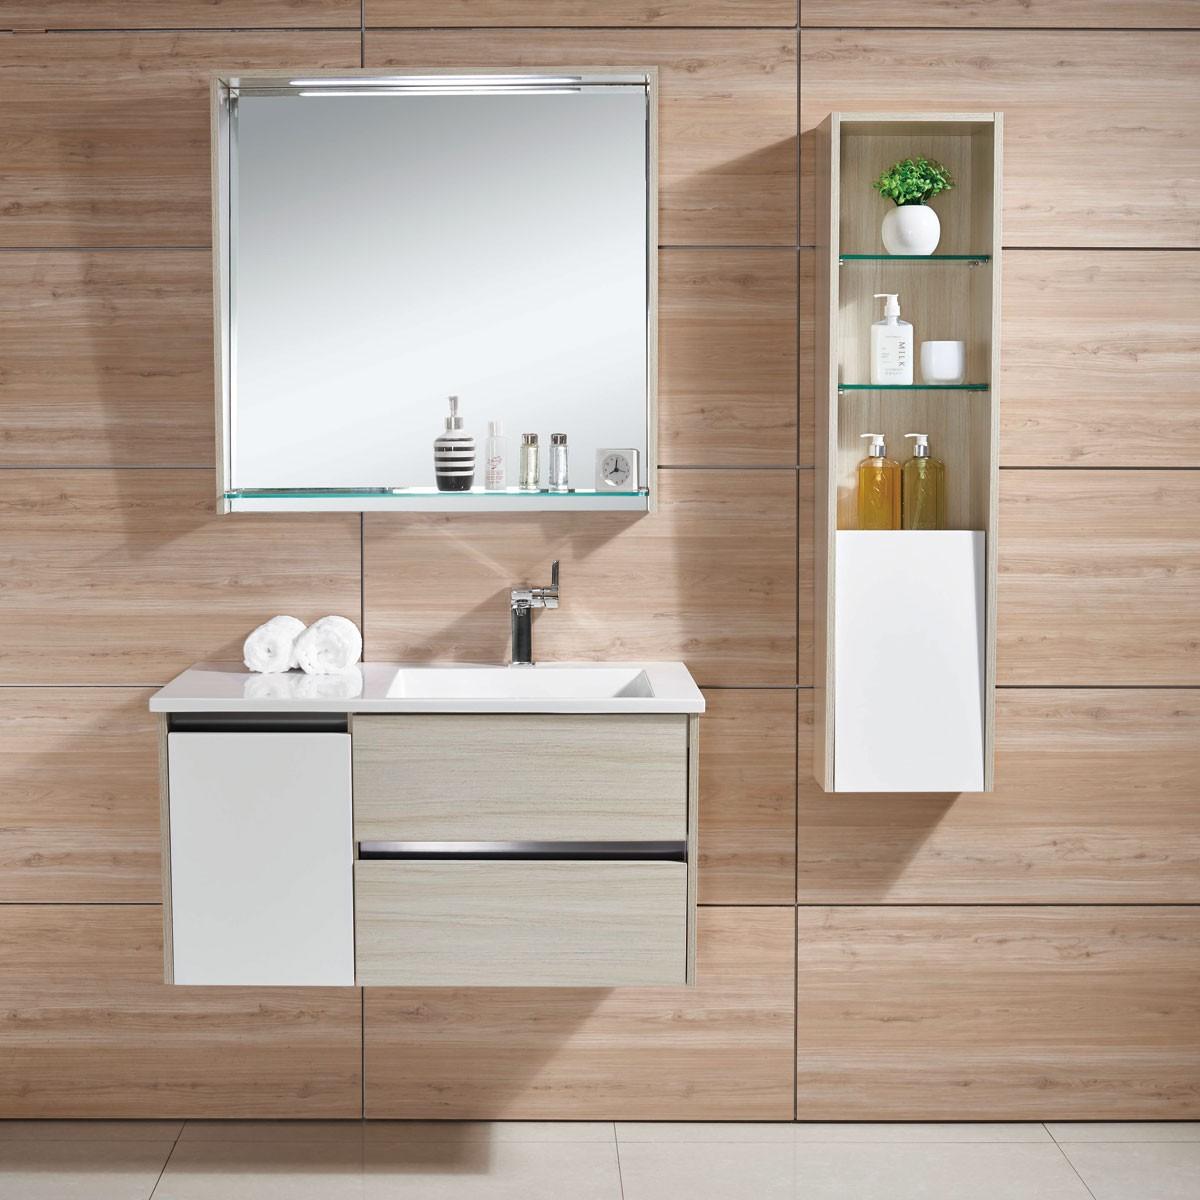 24 In. Wall Mount Bathroom Vanity Set with Single Sink and Mirror (DK-605600)